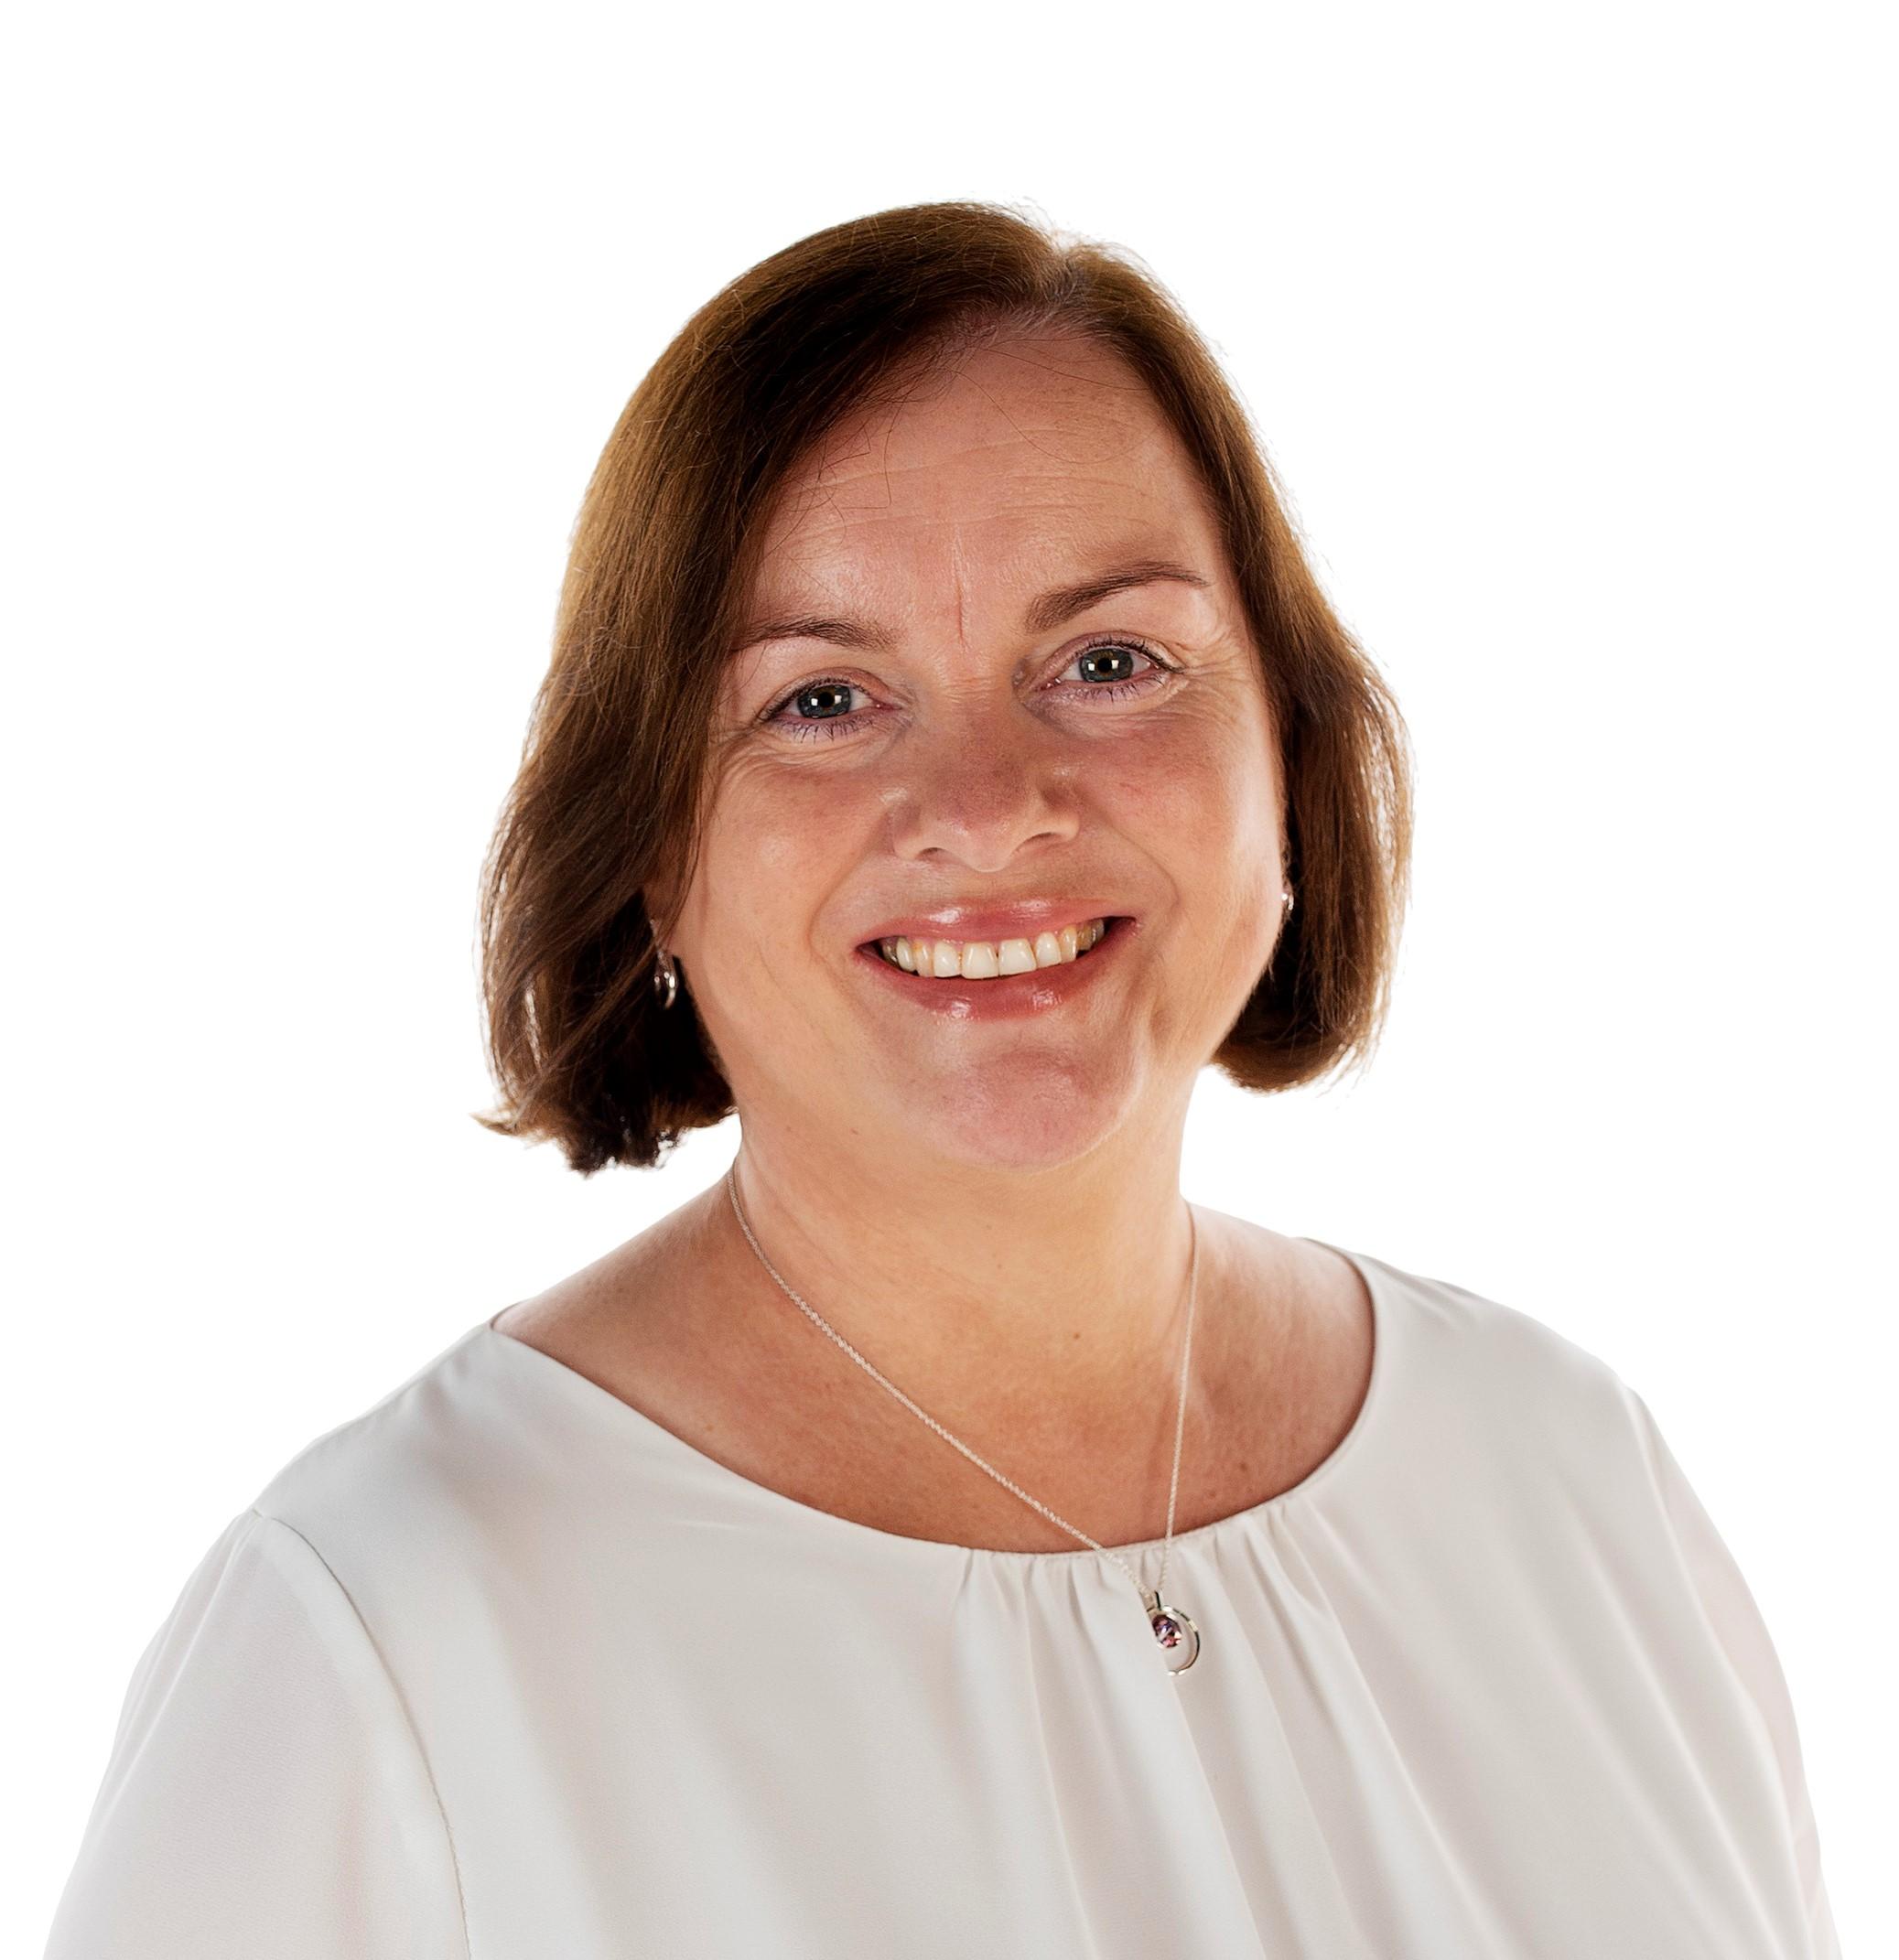 MPKI Chief Ethics Officer, Katherine Finnegan